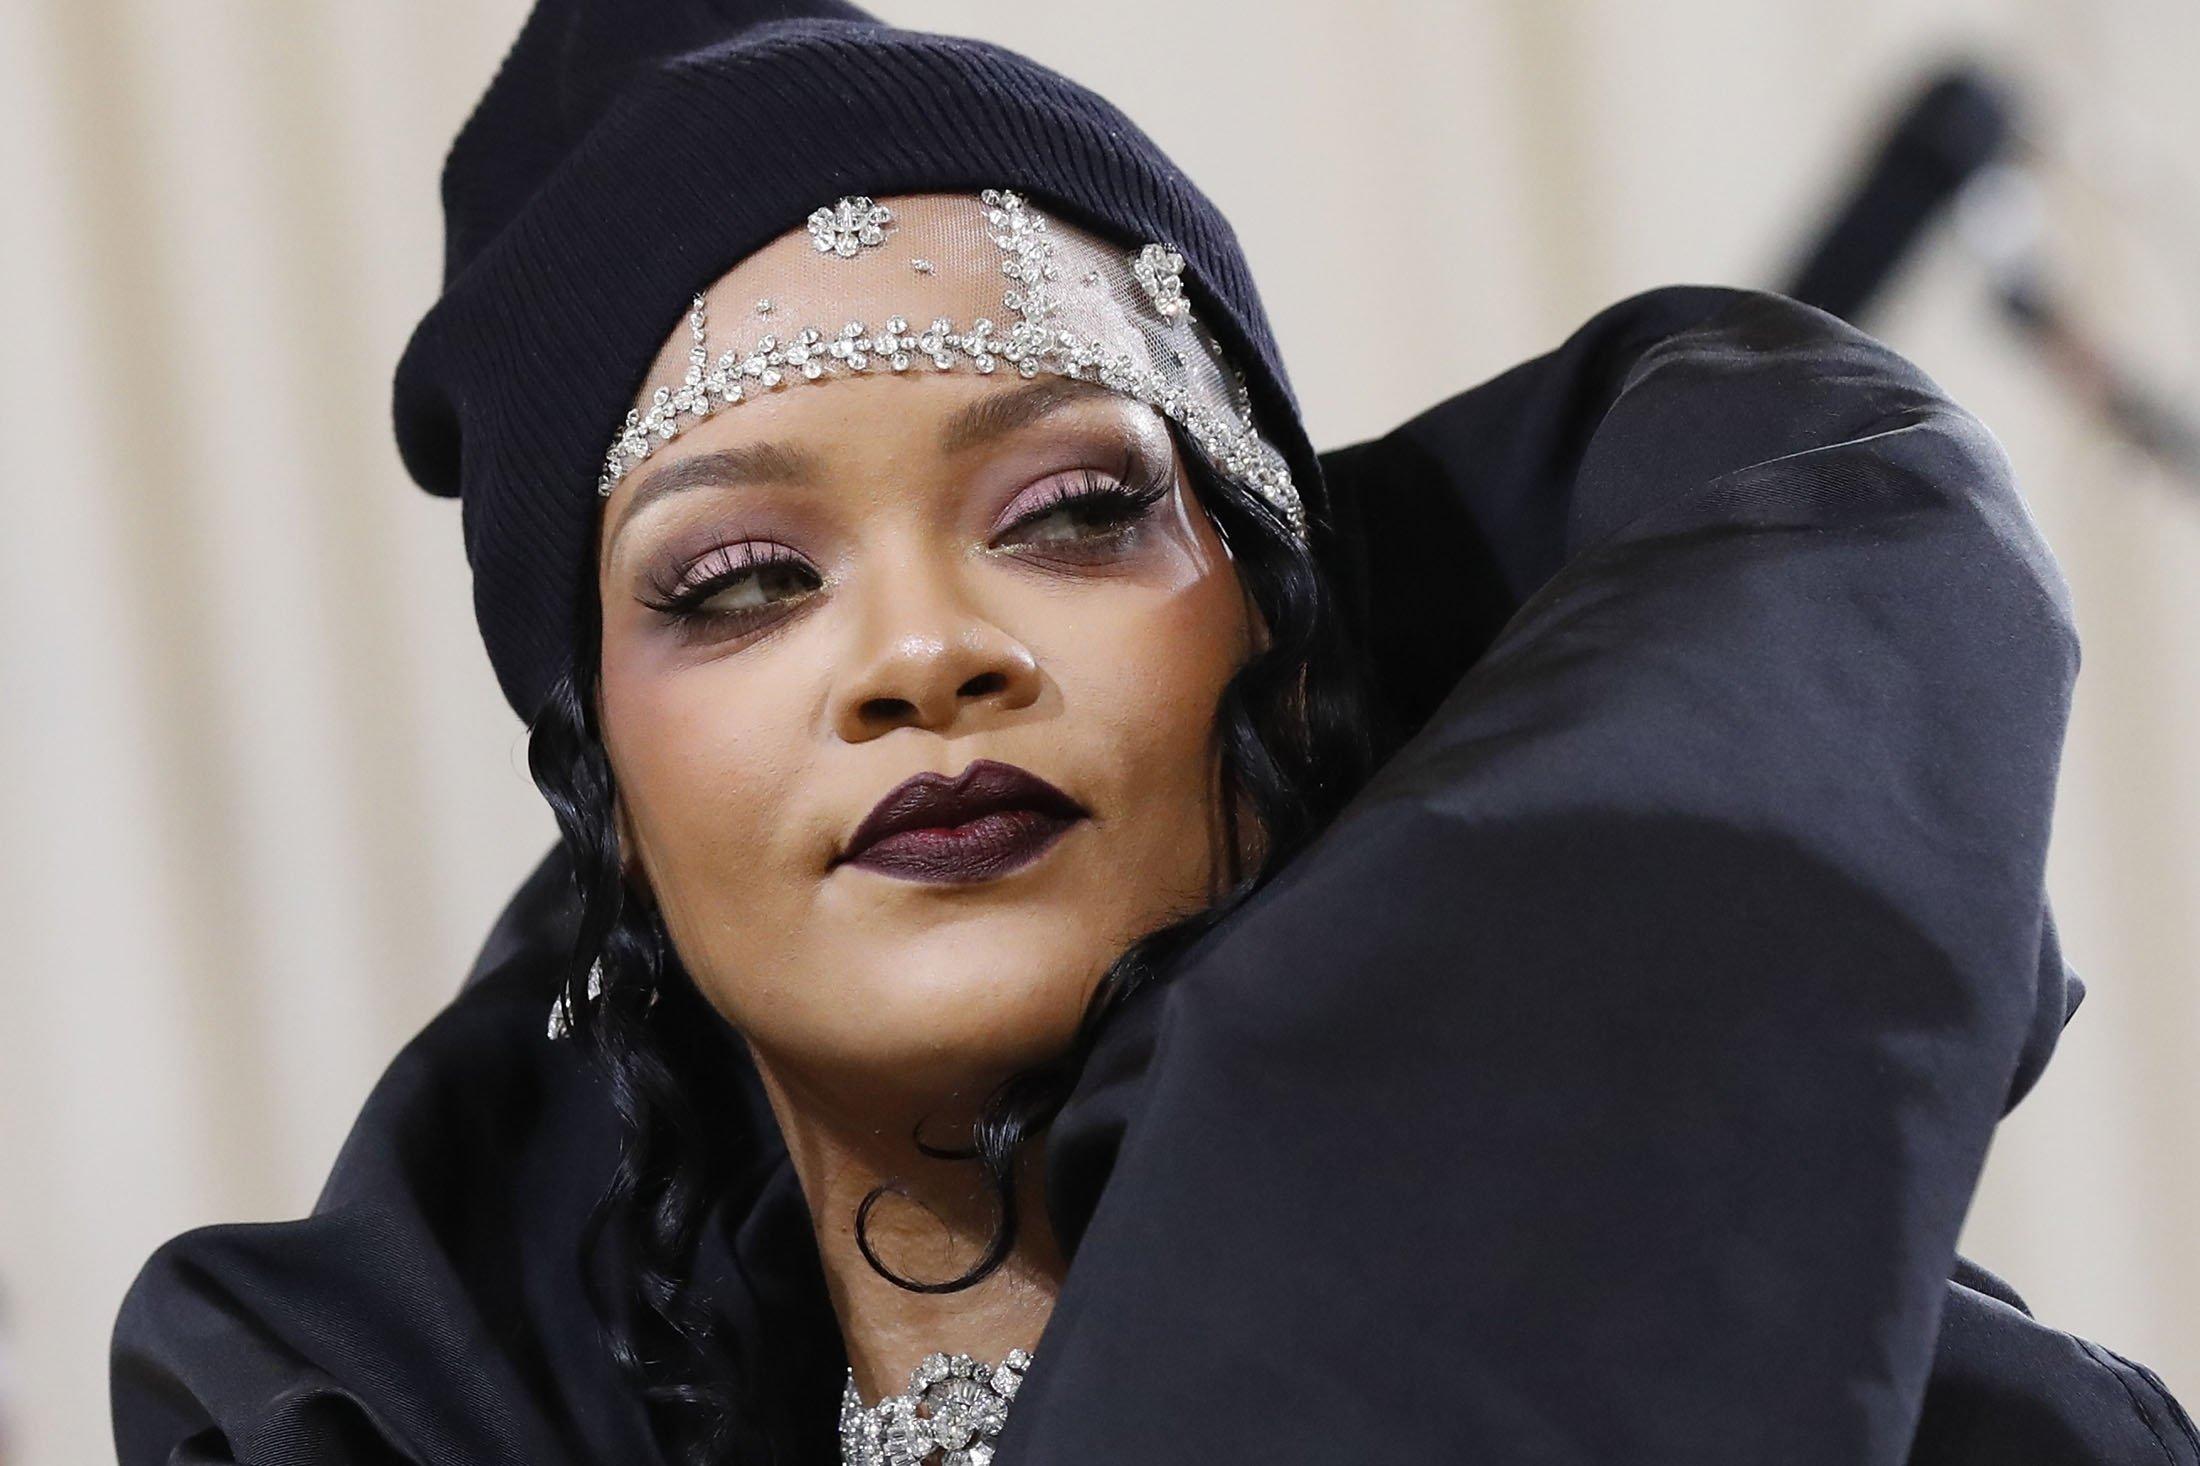 Rihanna arrives for the 2021 Met Gala at the Metropolitan Museum of Art, in New York, U.S., Sept. 13, 2021. (Reuters Photo)